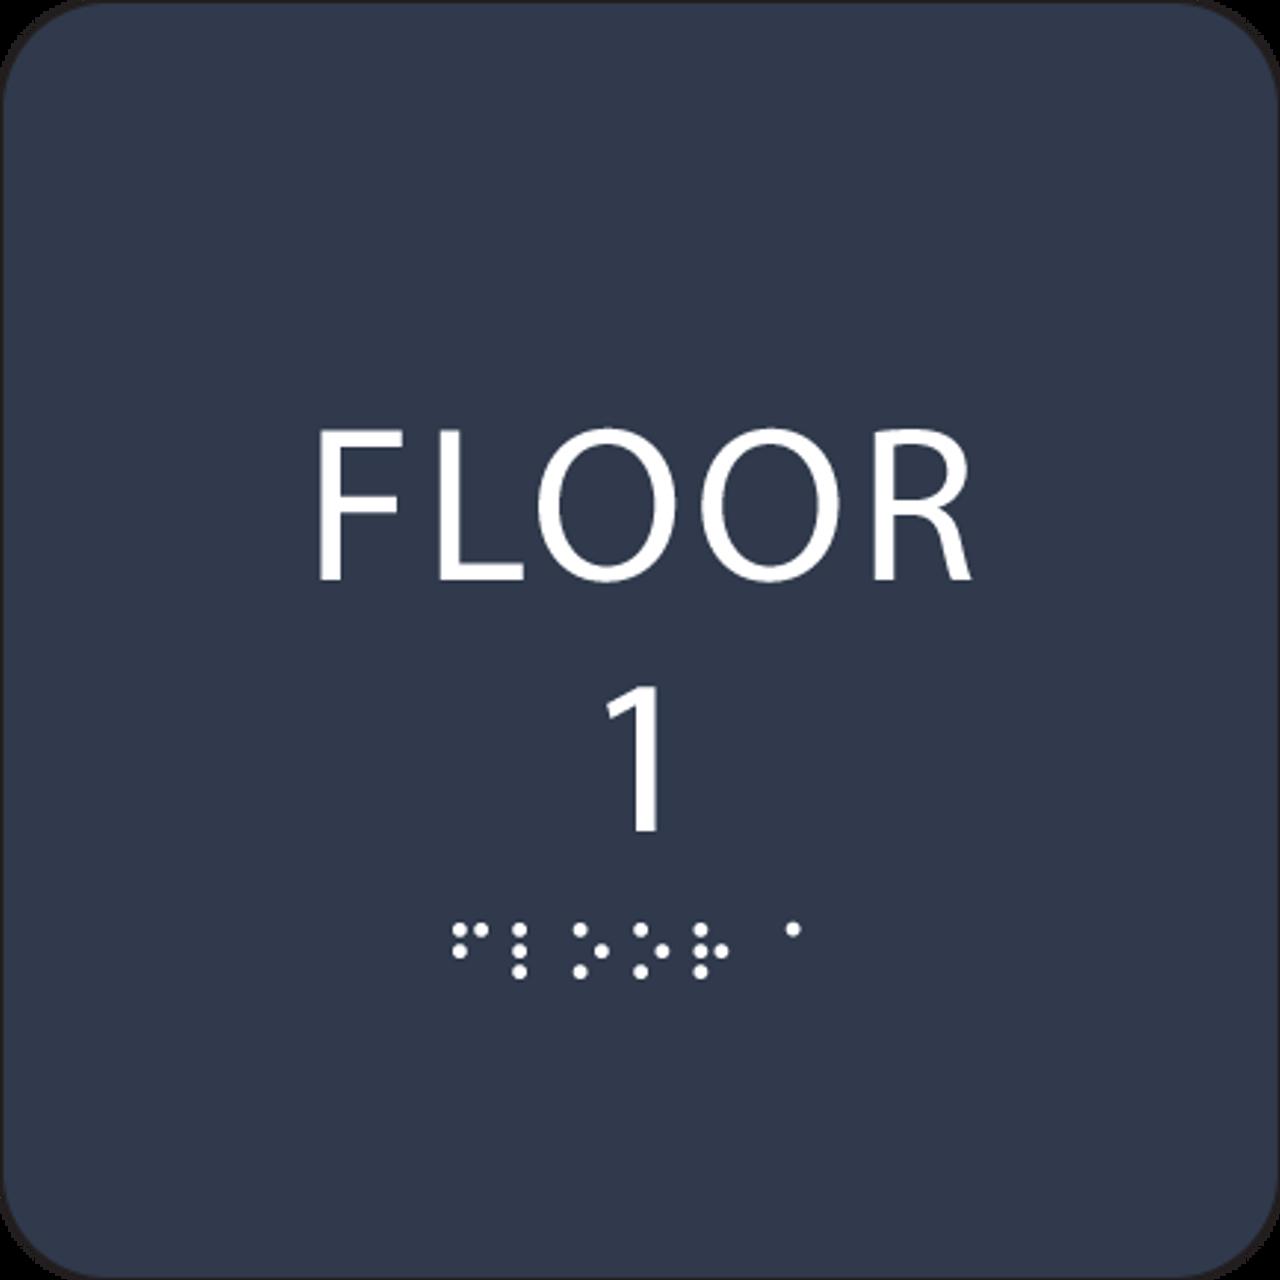 Navy Floor 1 Identification Sign